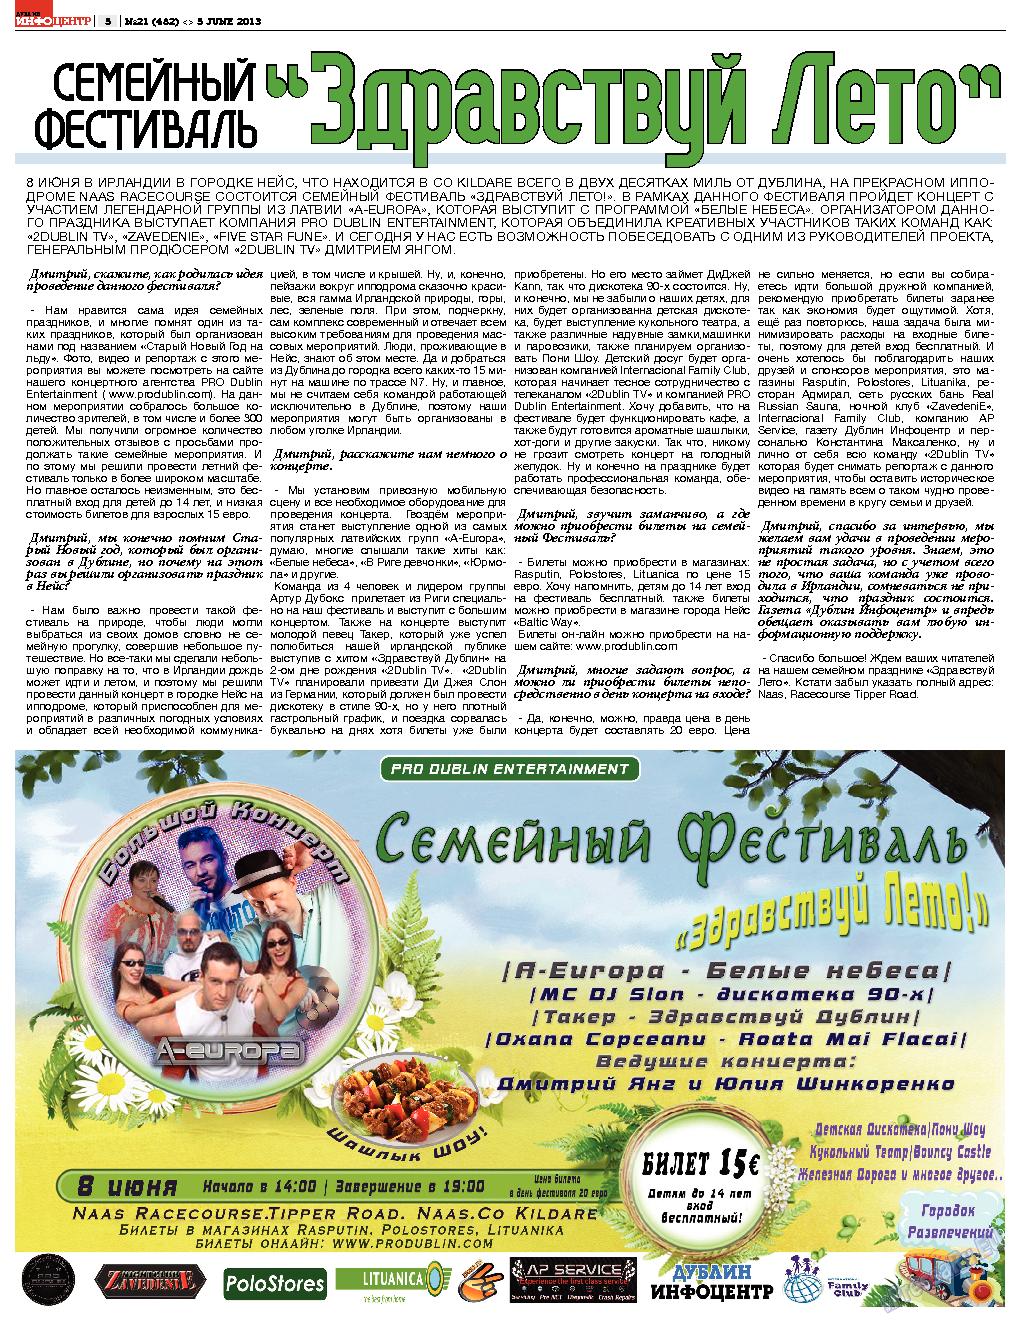 Дублин инфоцентр (газета). 2013 год, номер 21, стр. 5